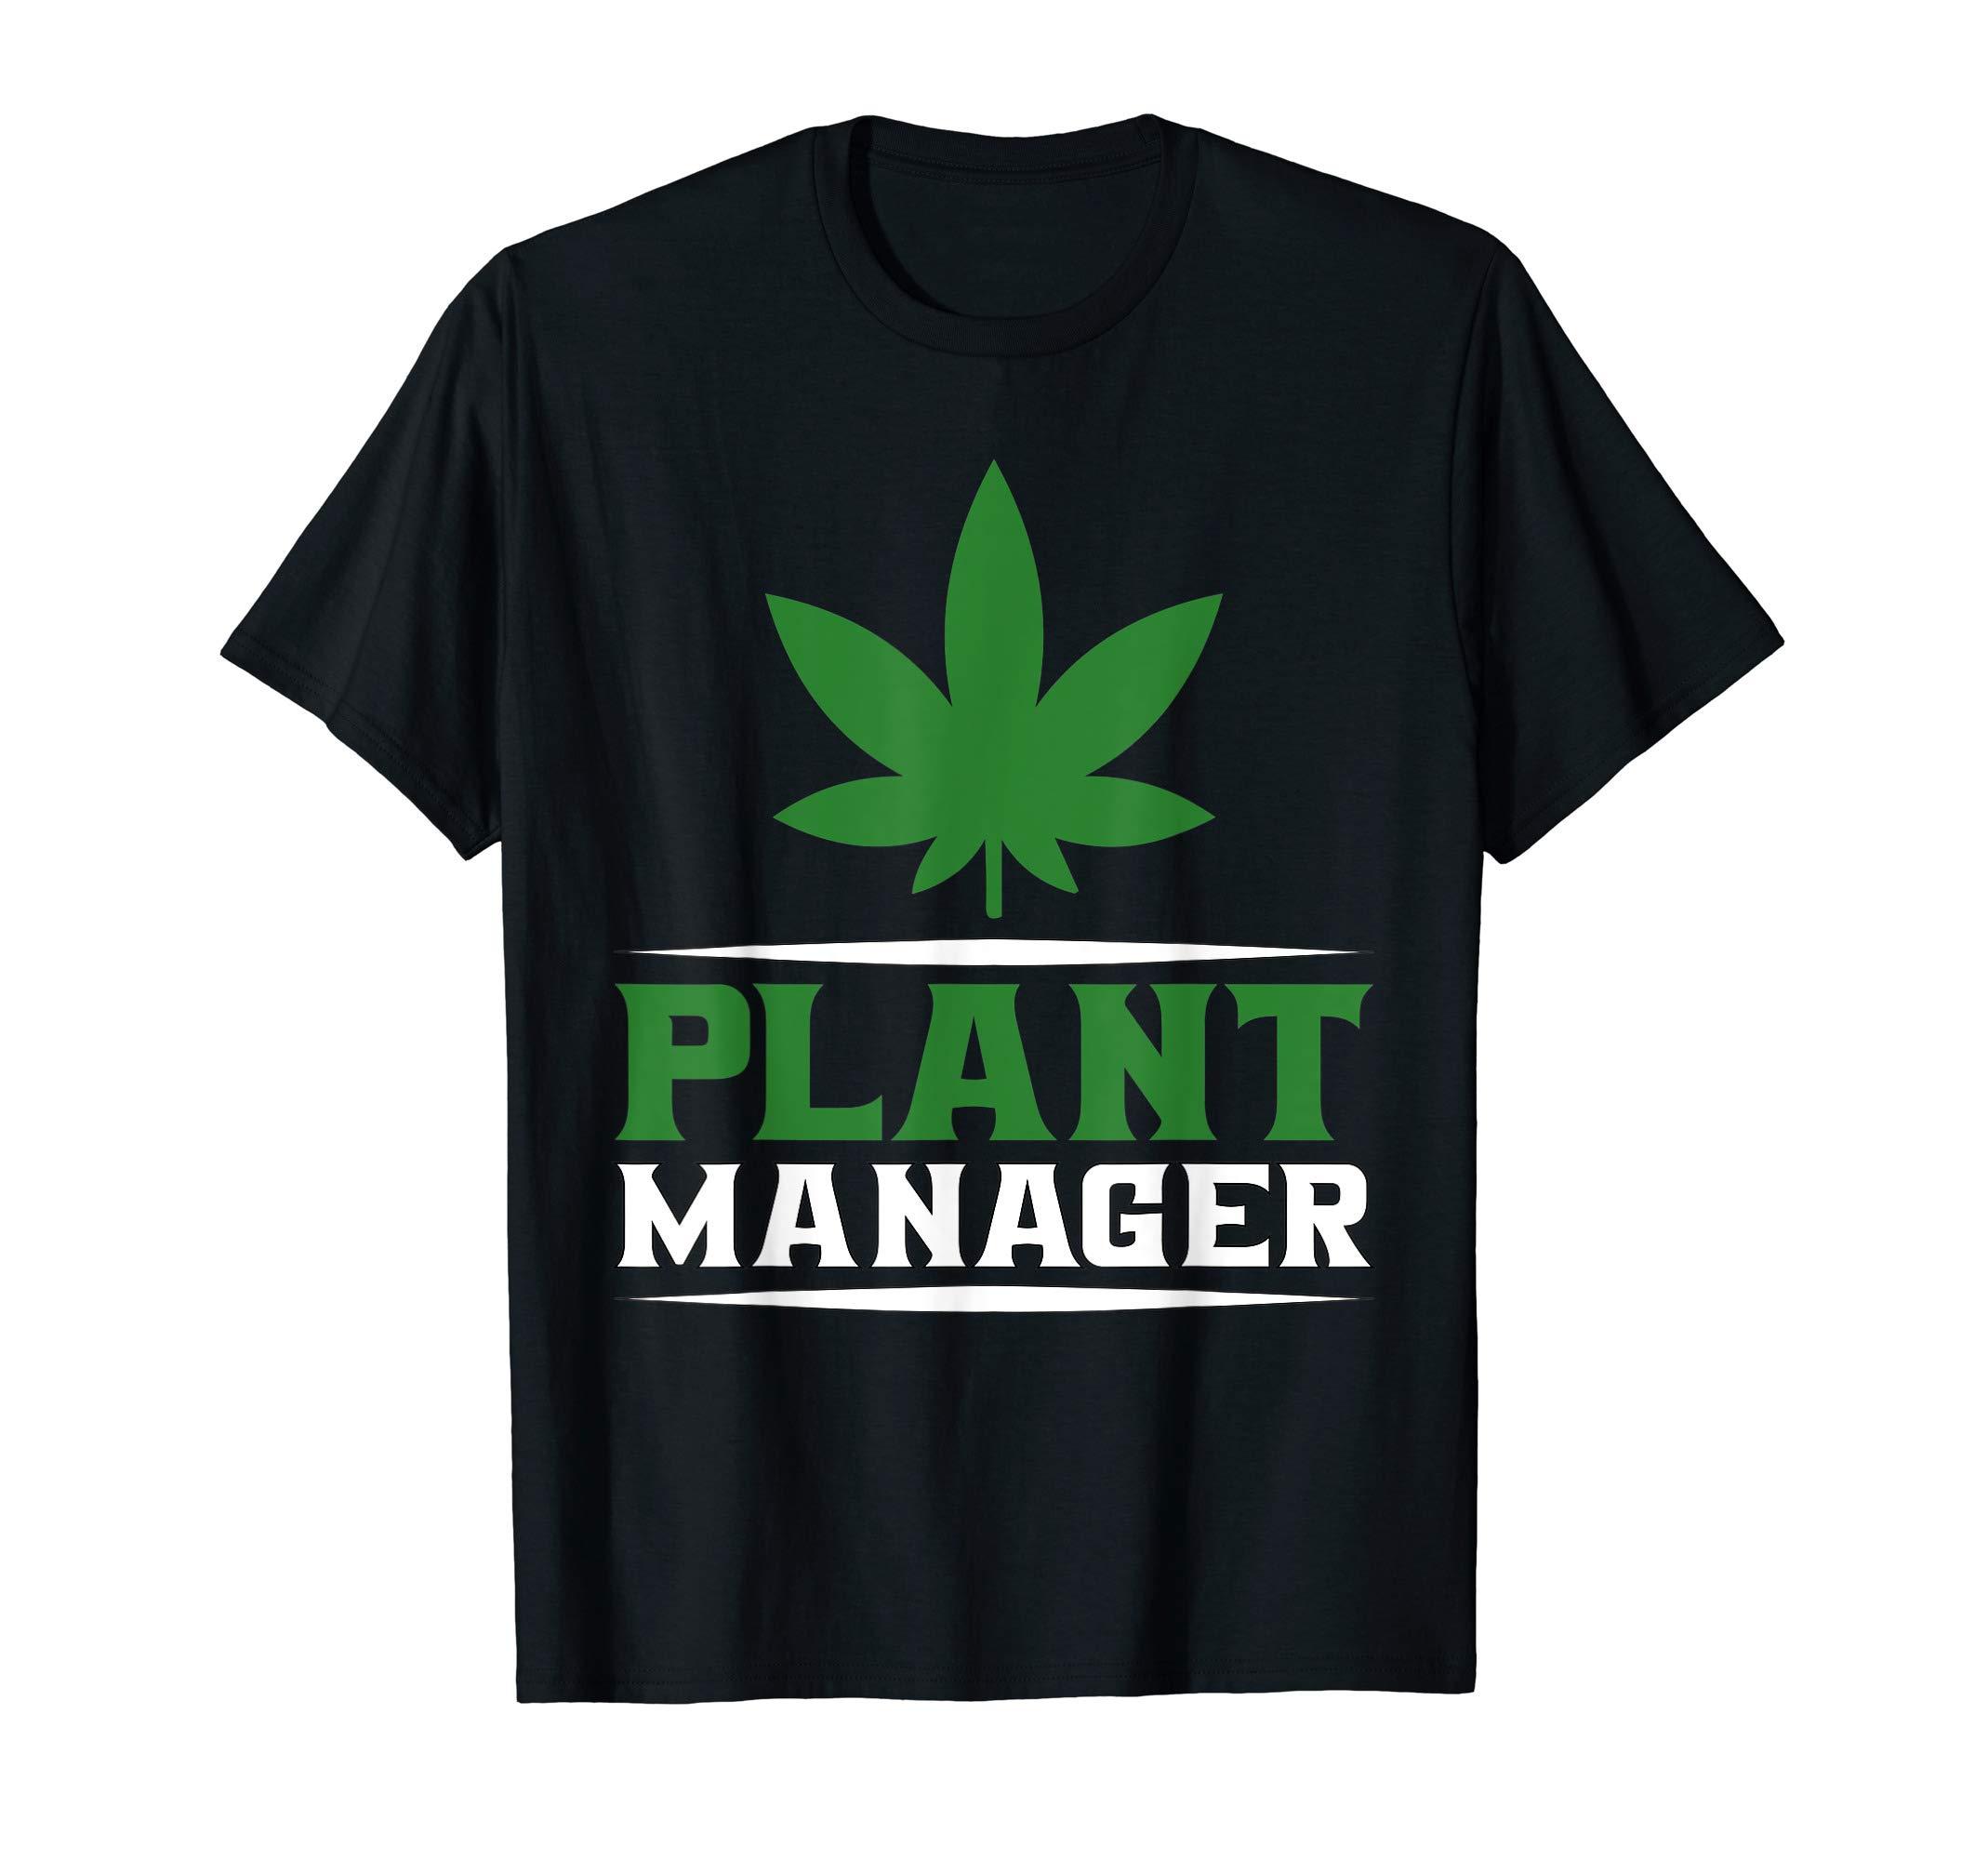 Plant Manager | Marijuana Cannabis 420 Pot/Weed Stoner Ganja T-Shirt